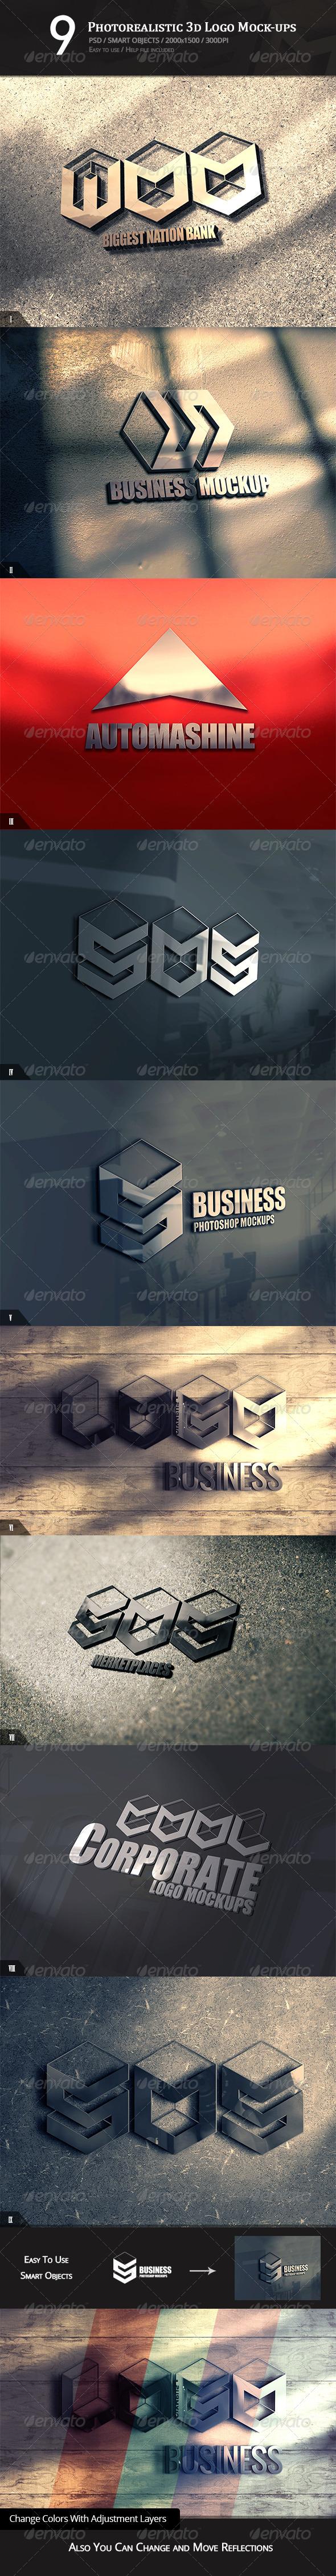 9 Photorealistic 3D Logo Mock-ups - Logo Product Mock-Ups